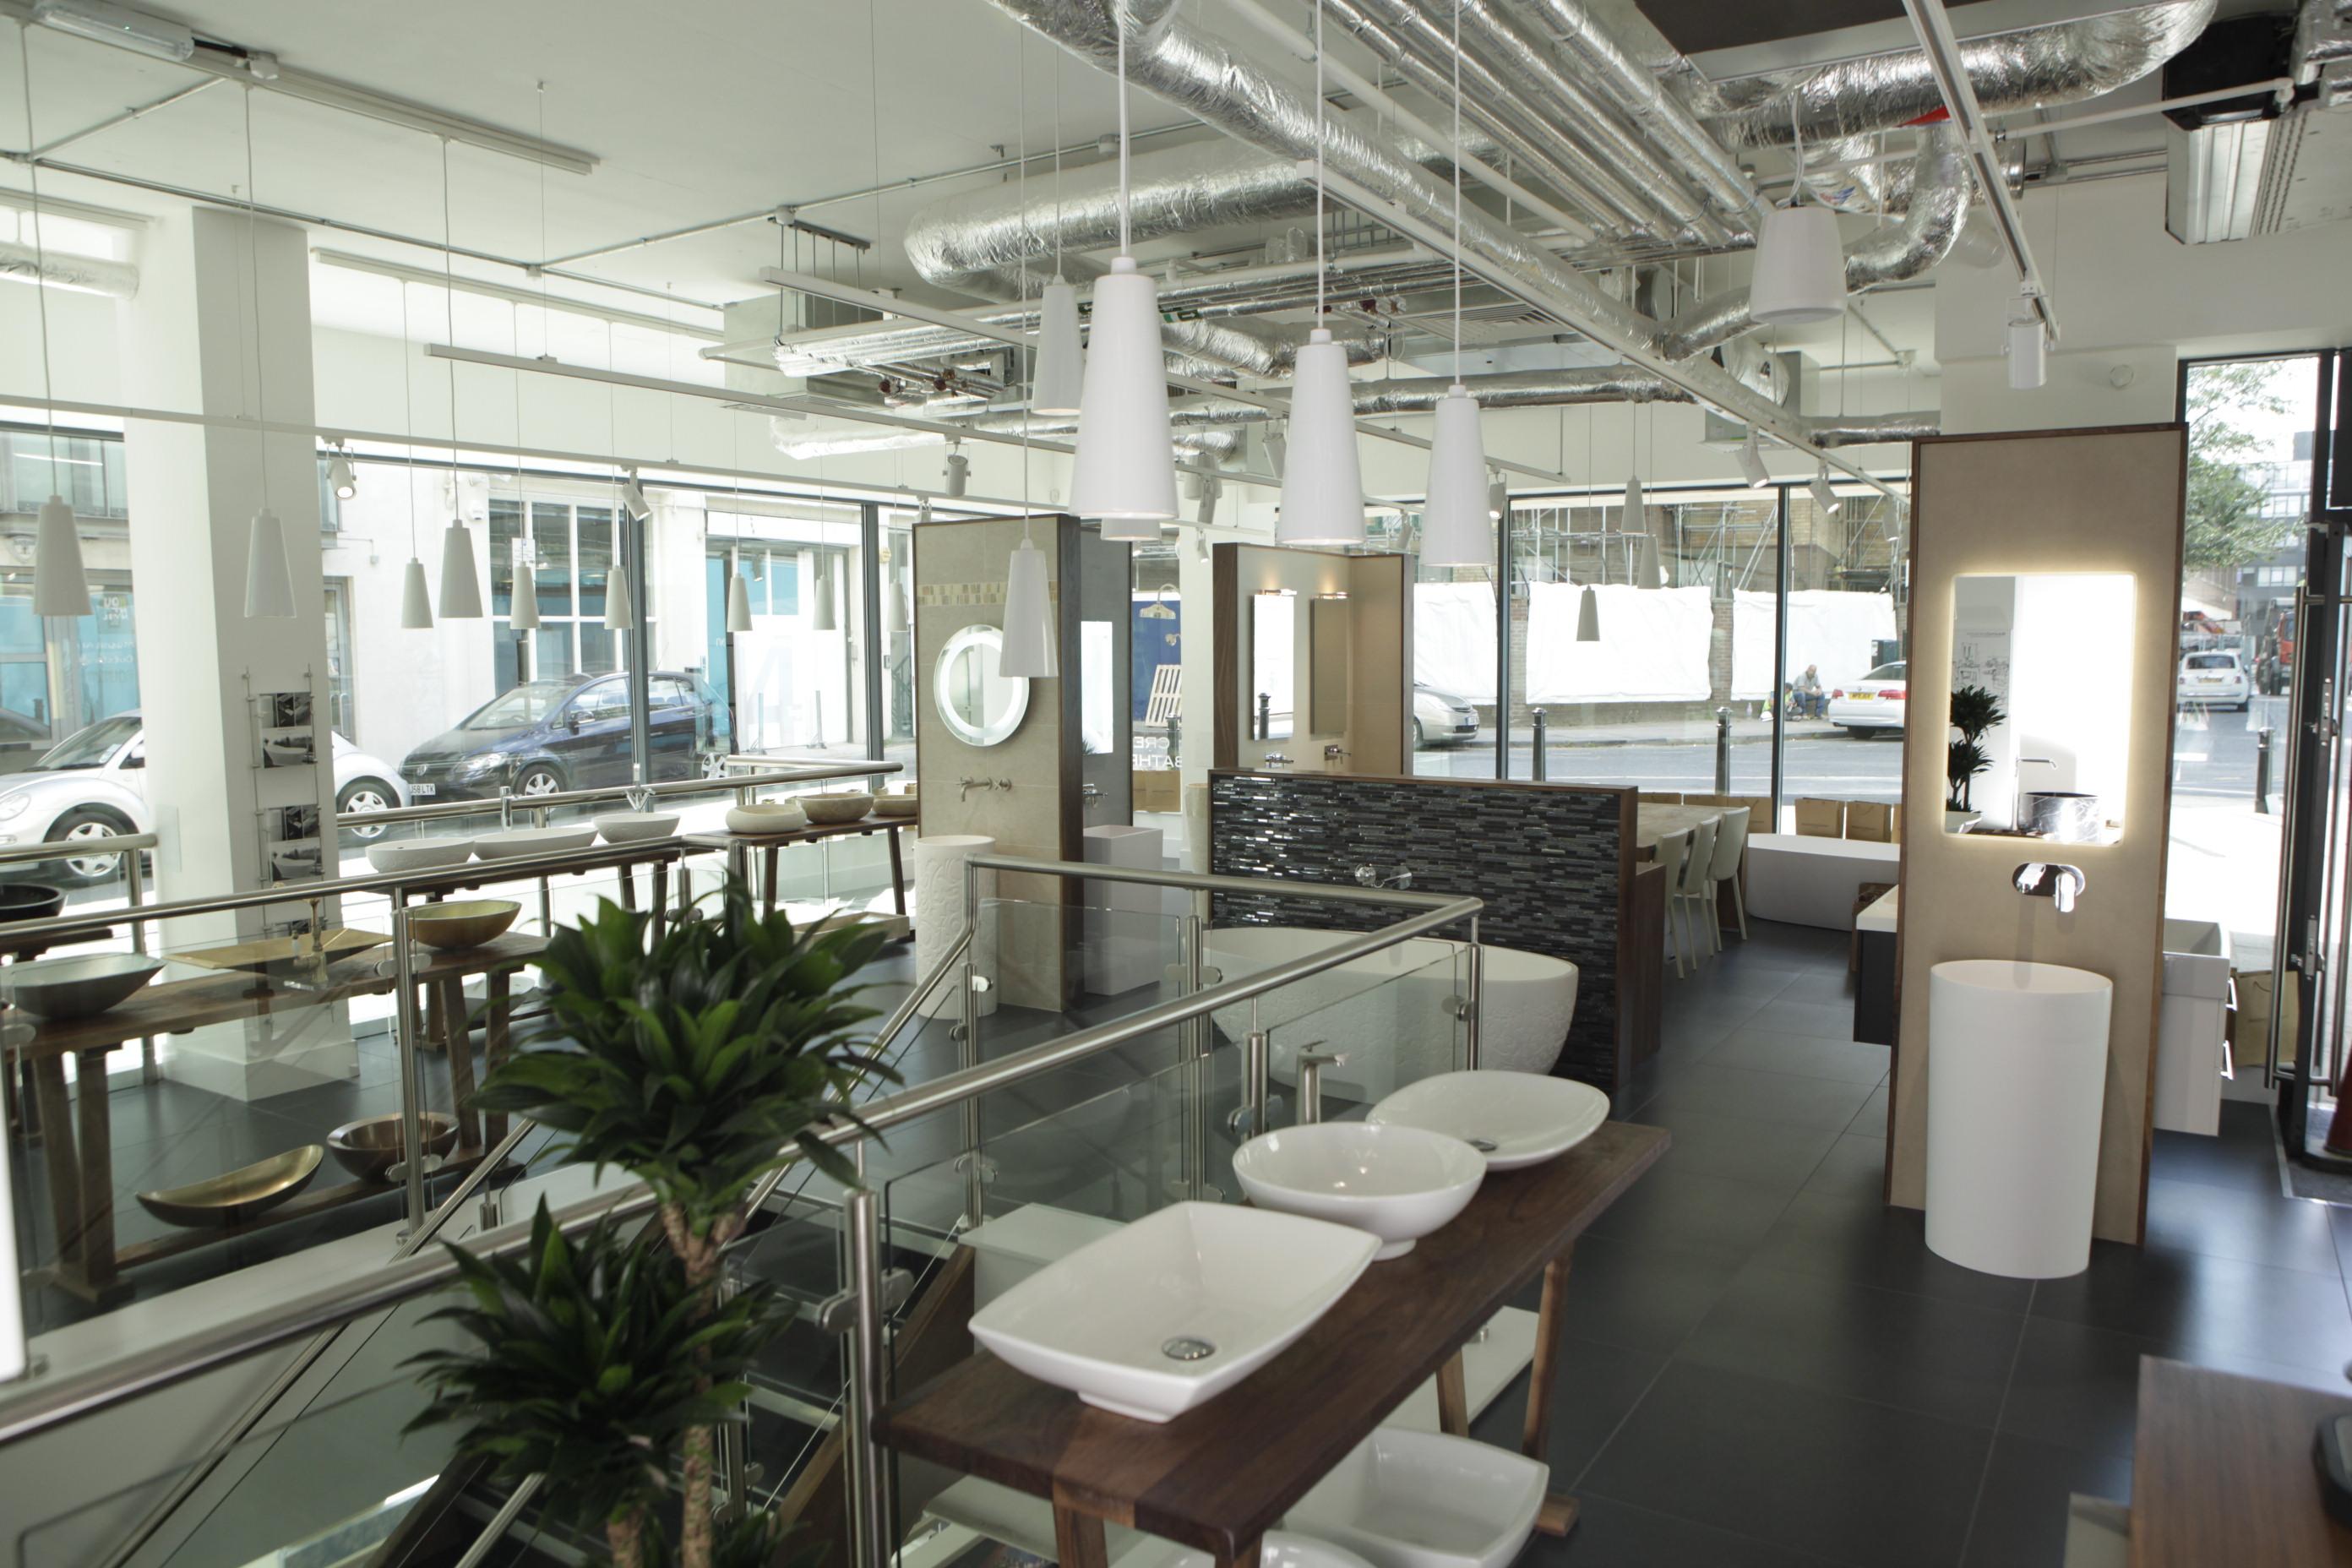 Bagno design london bagnodesign uk on twitter